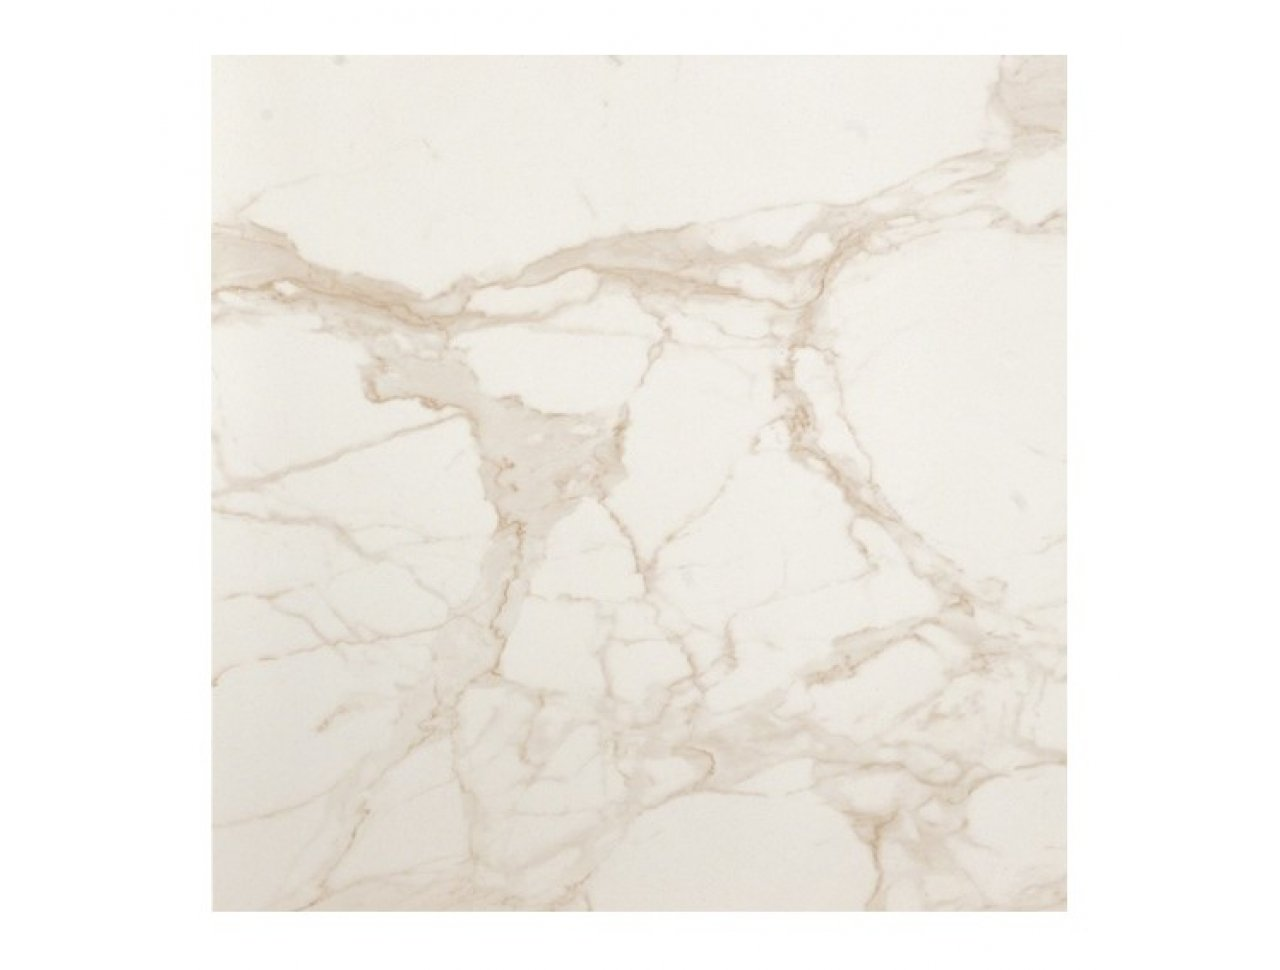 Напольная плитка FAP Roma Diamond Calacatta Brillante 60 x 60 см, Арт. fNER